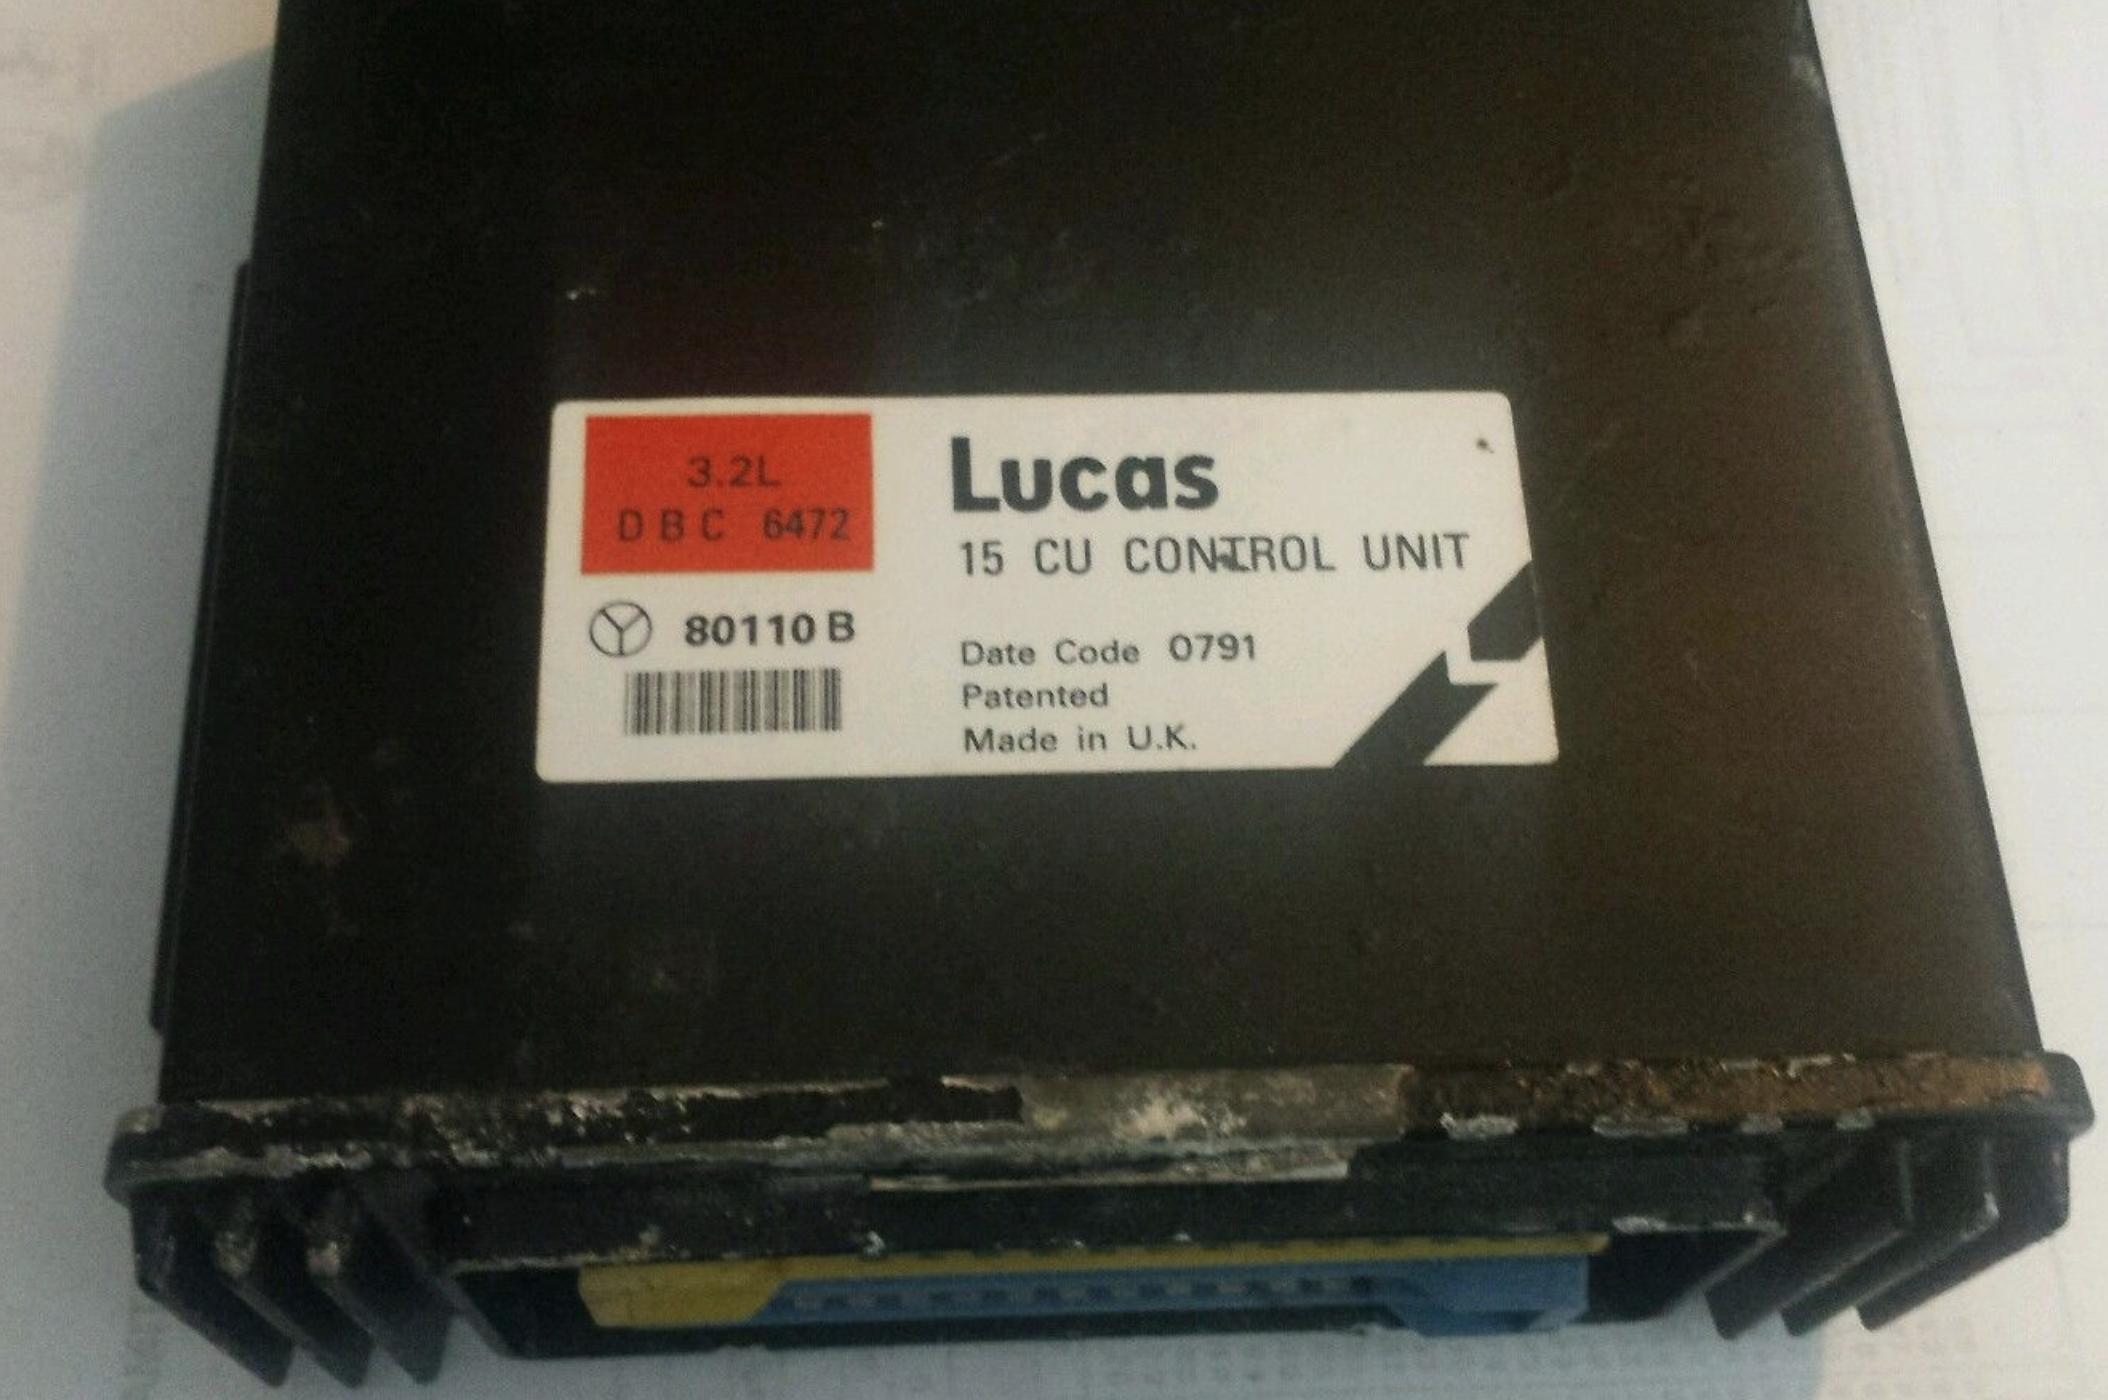 Engine control unit ecu jaguar xj6 3 2 dbc 6472 80110b, sale auto spare  part on pieces-okaz com